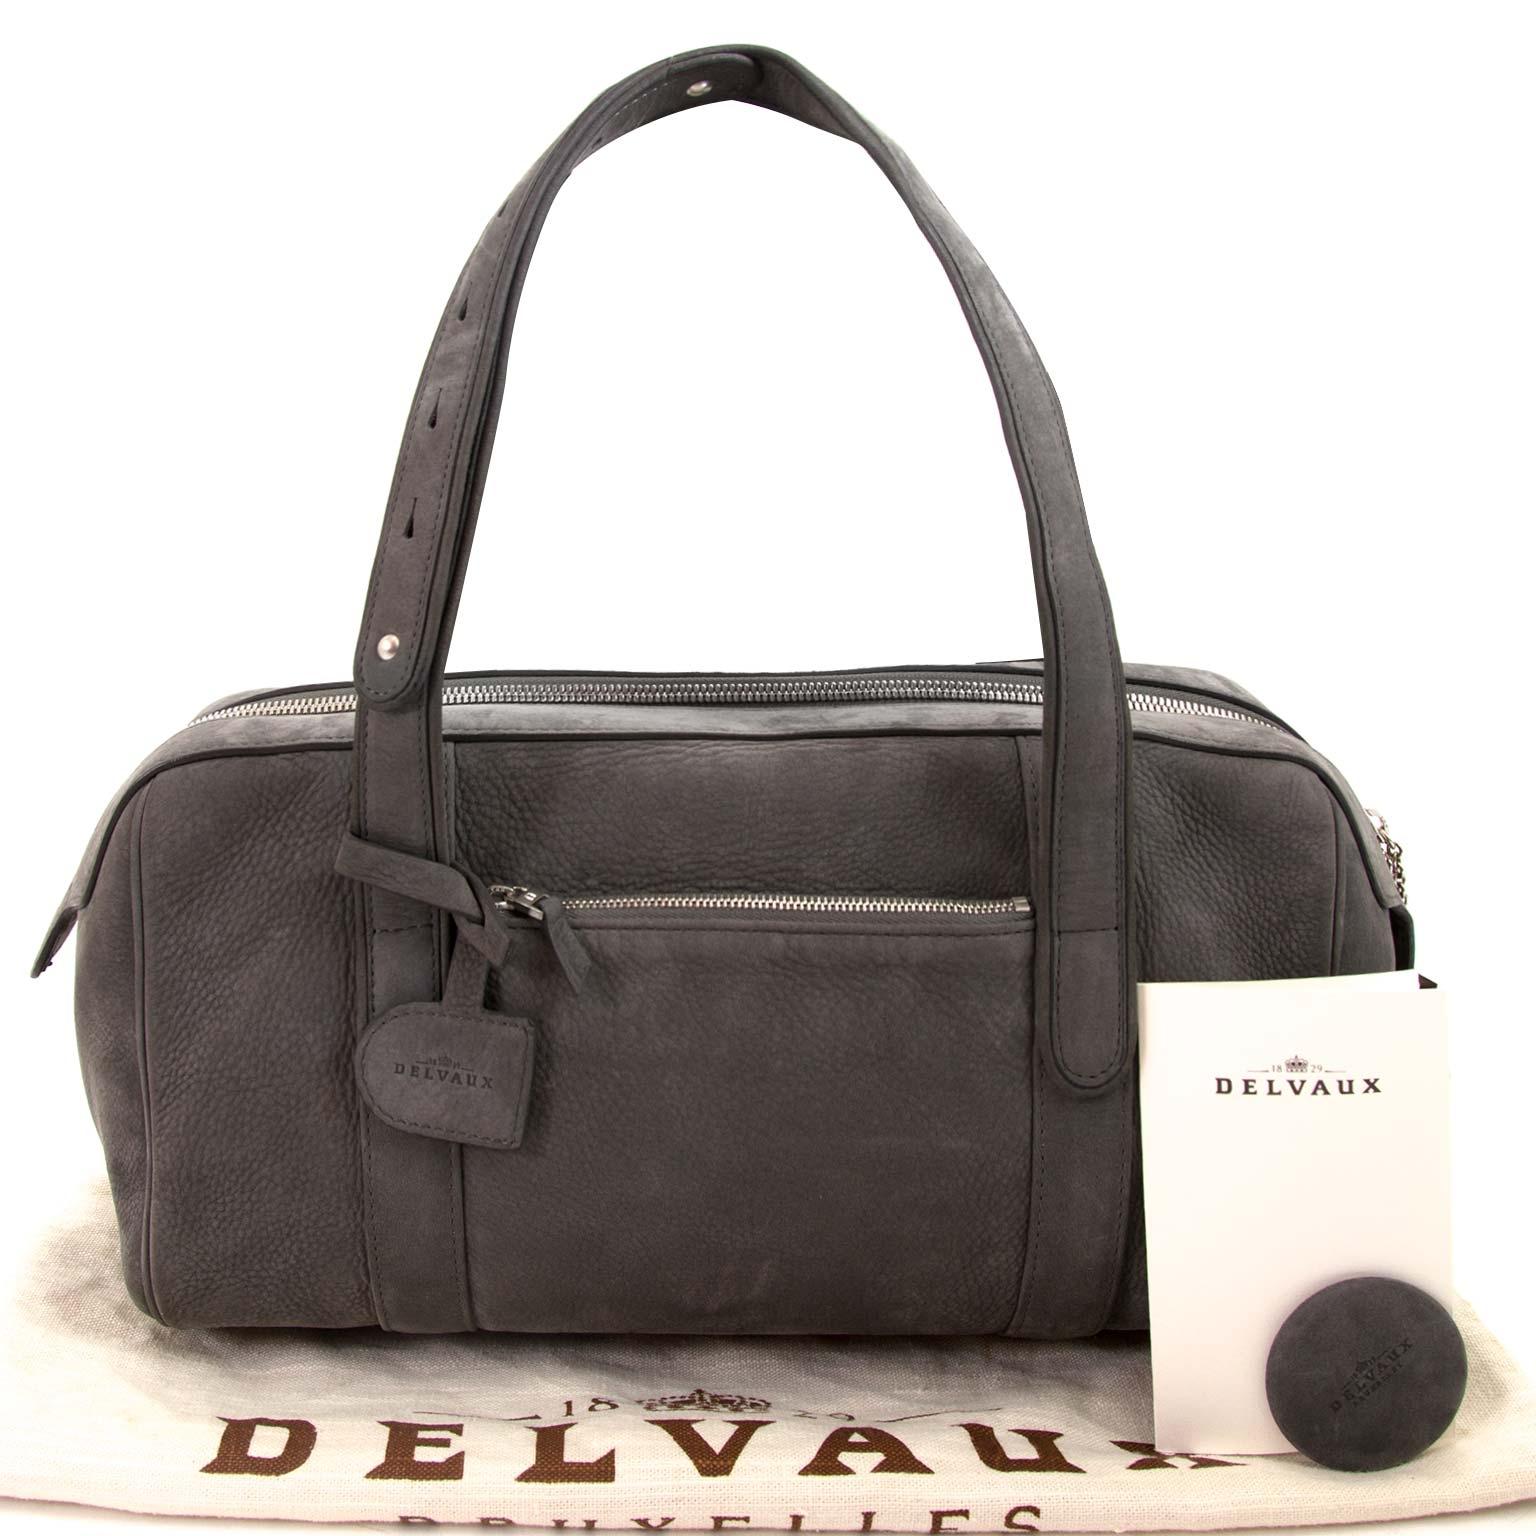 8d74545bdc5 ... delvaux loft santiag grey nubuck shoulder bag now for sale at labellov  vintage fashion webshop belgium